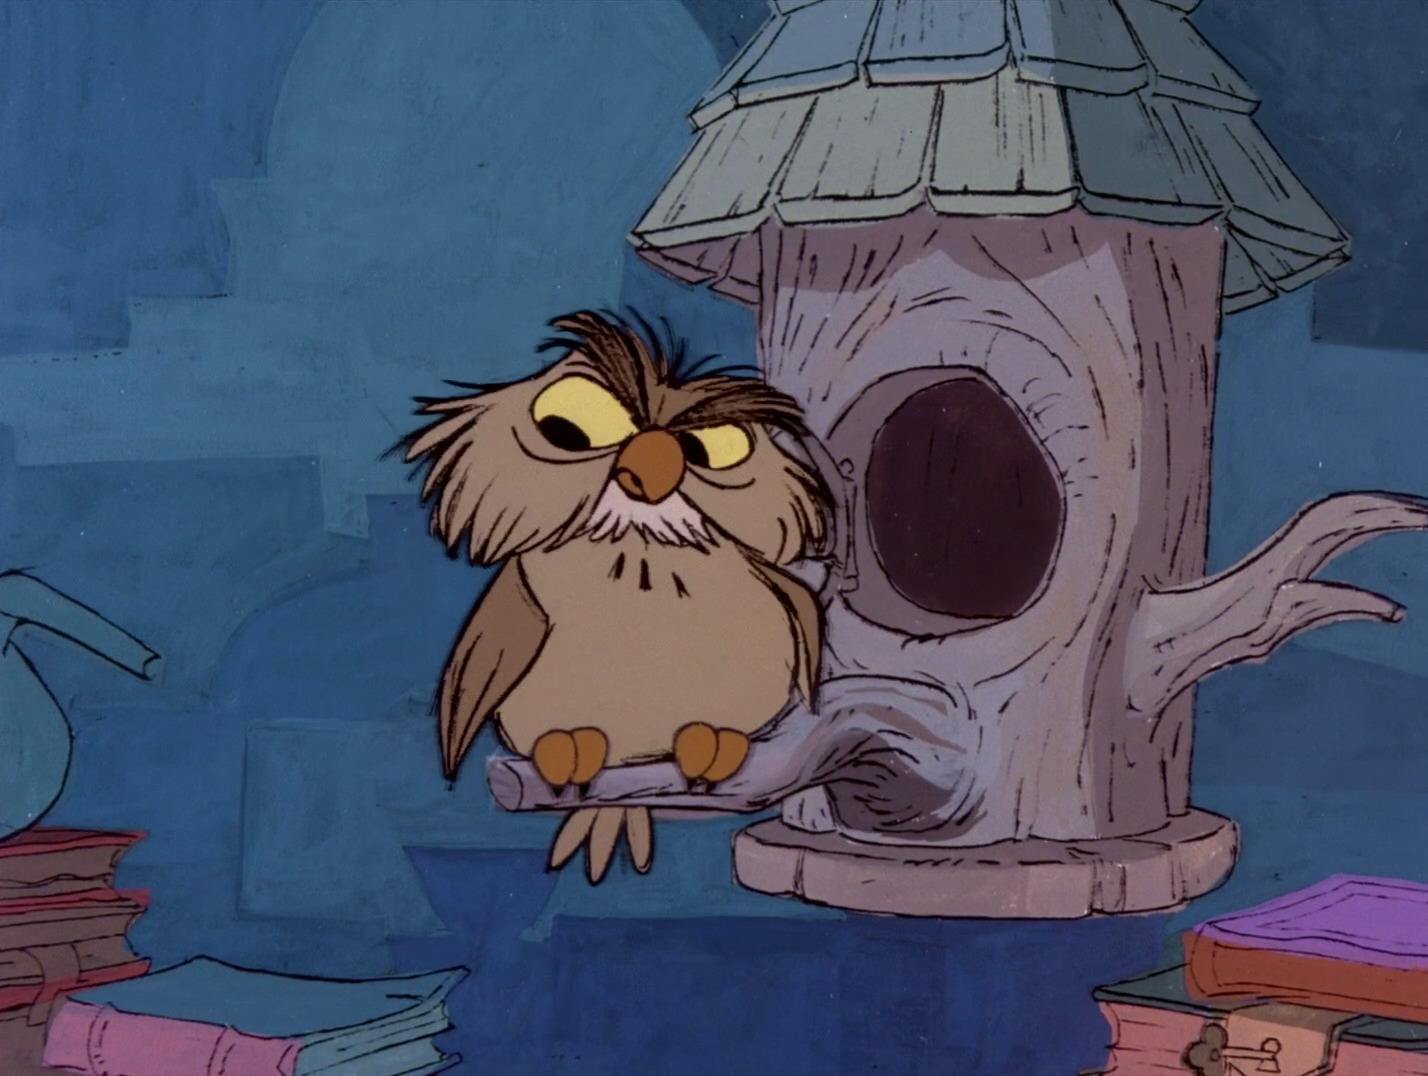 Image - Sword-in-stone-disneyscreencaps.com-1233.jpg ... Labyrinth Owl Tattoo